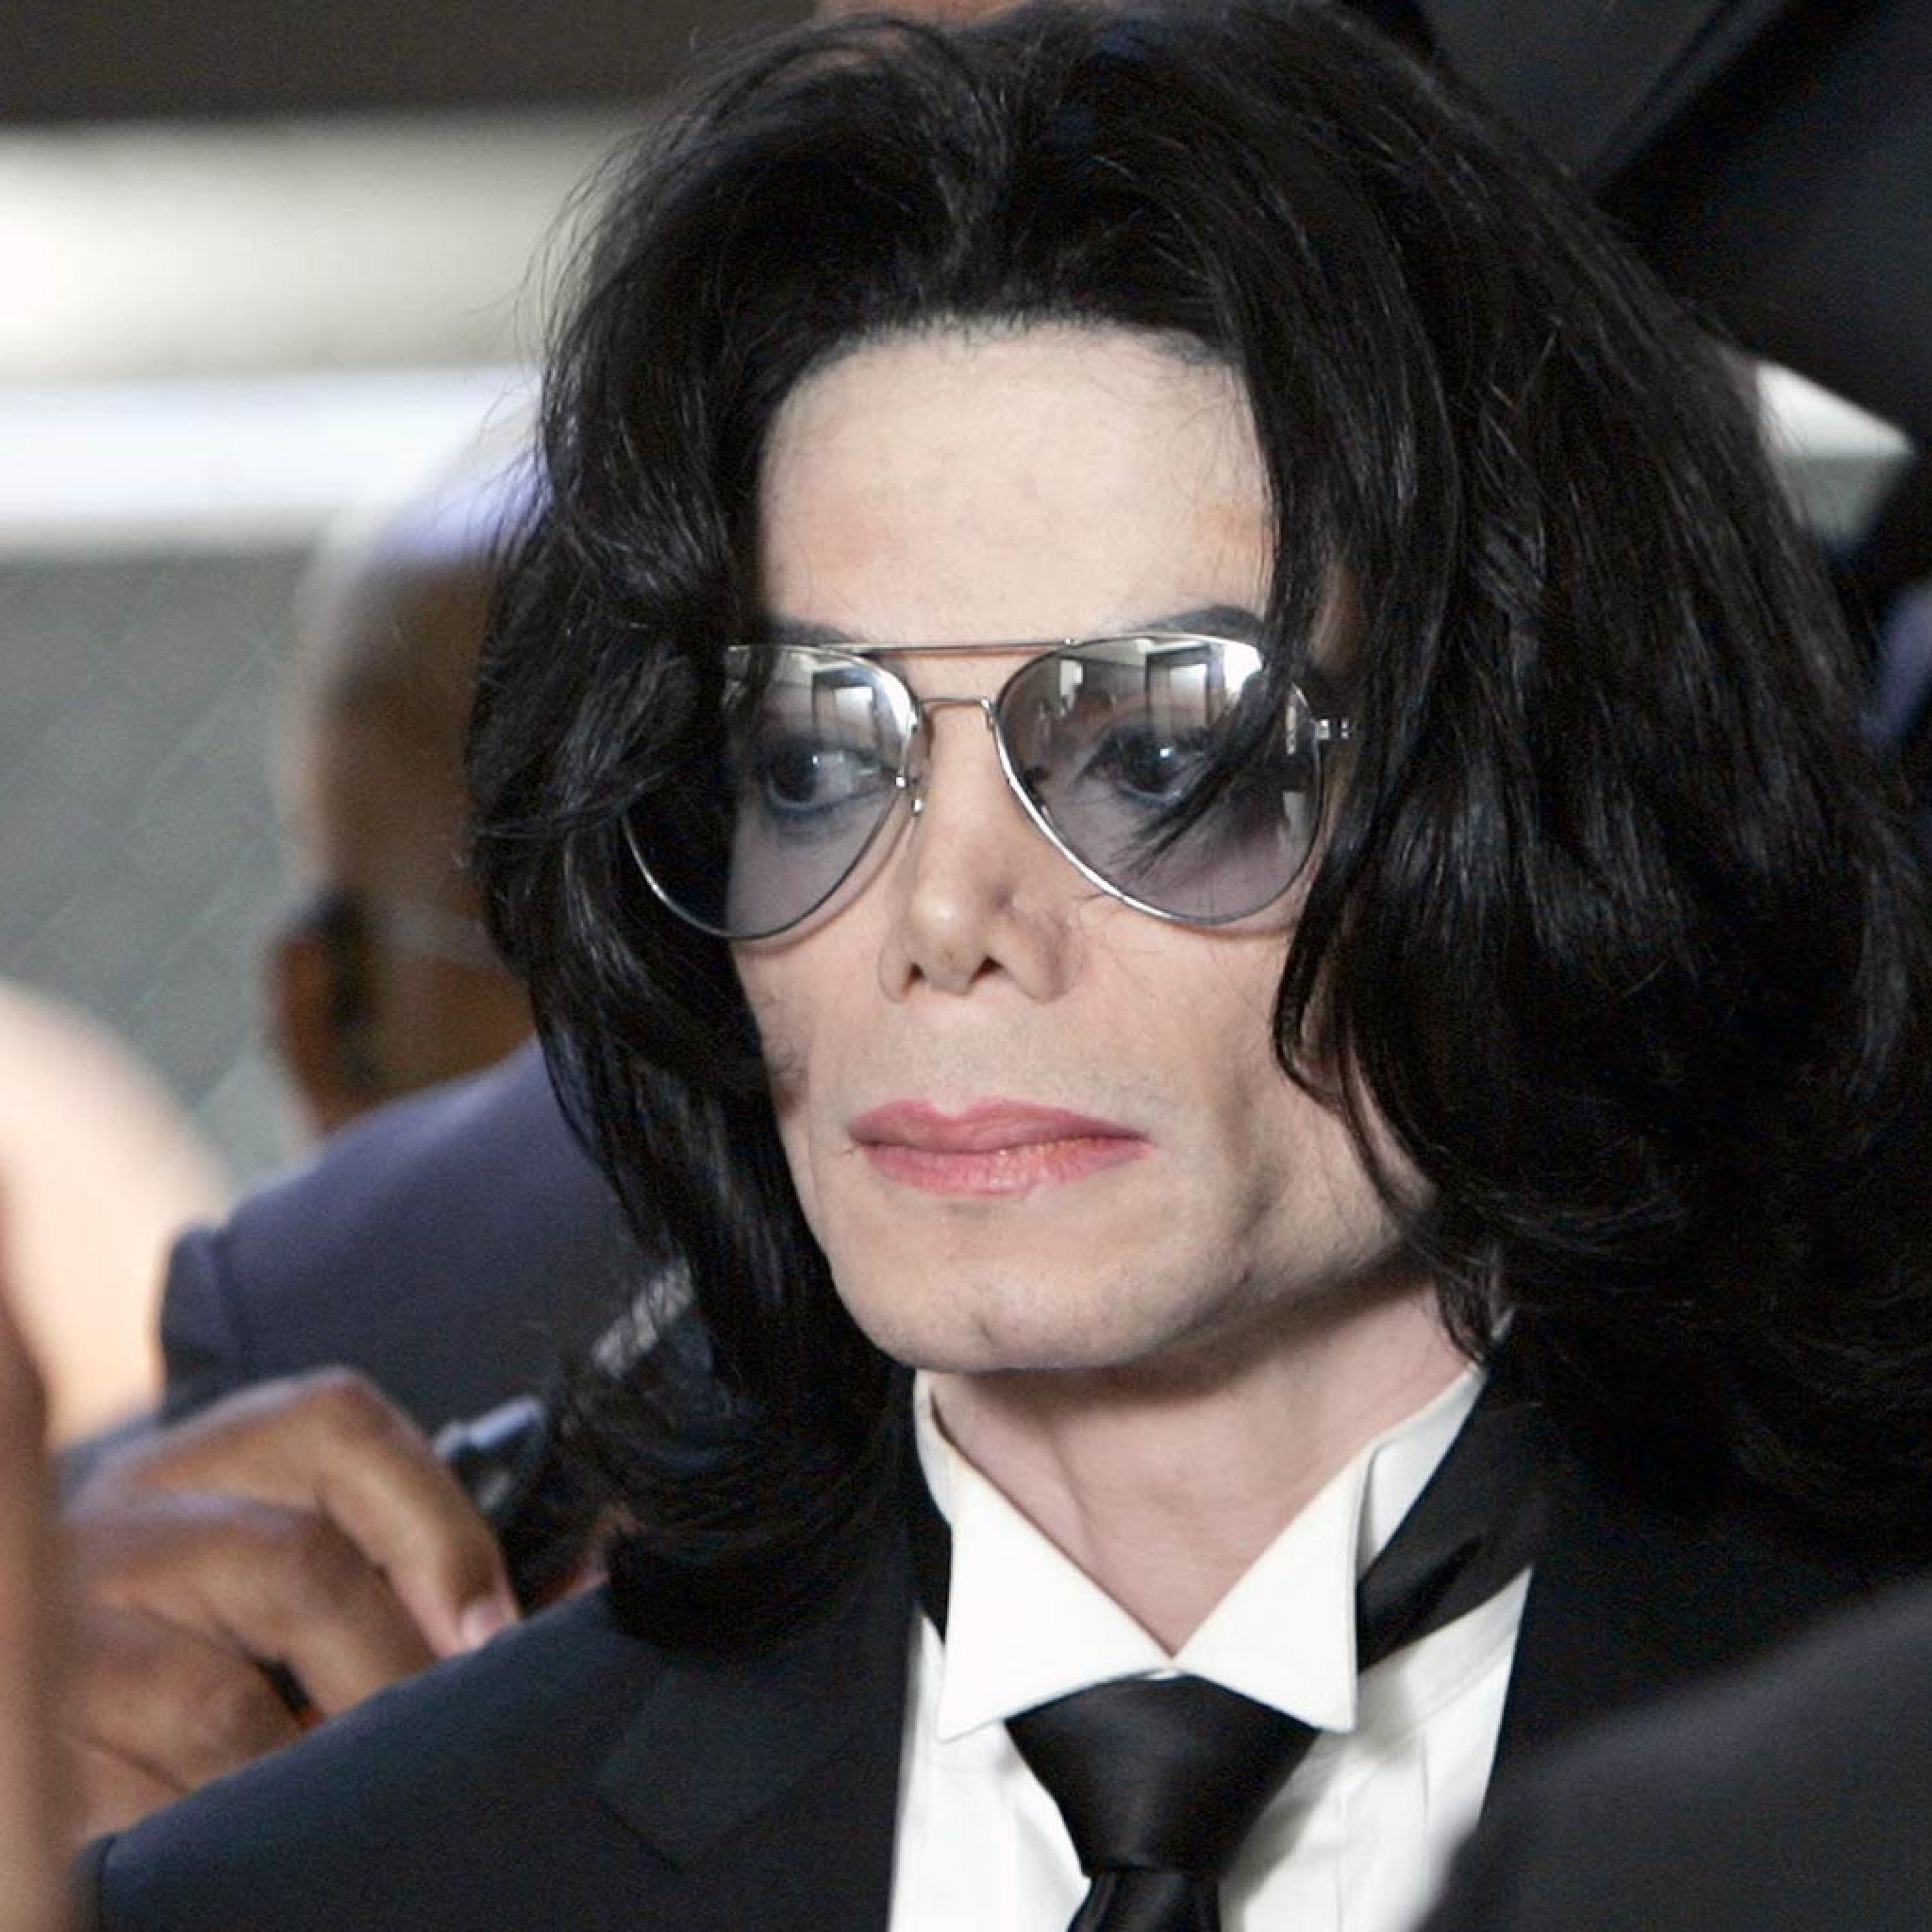 michael_jackson_glasses_man_pop_star_face_mysterious_8767_2048x2048